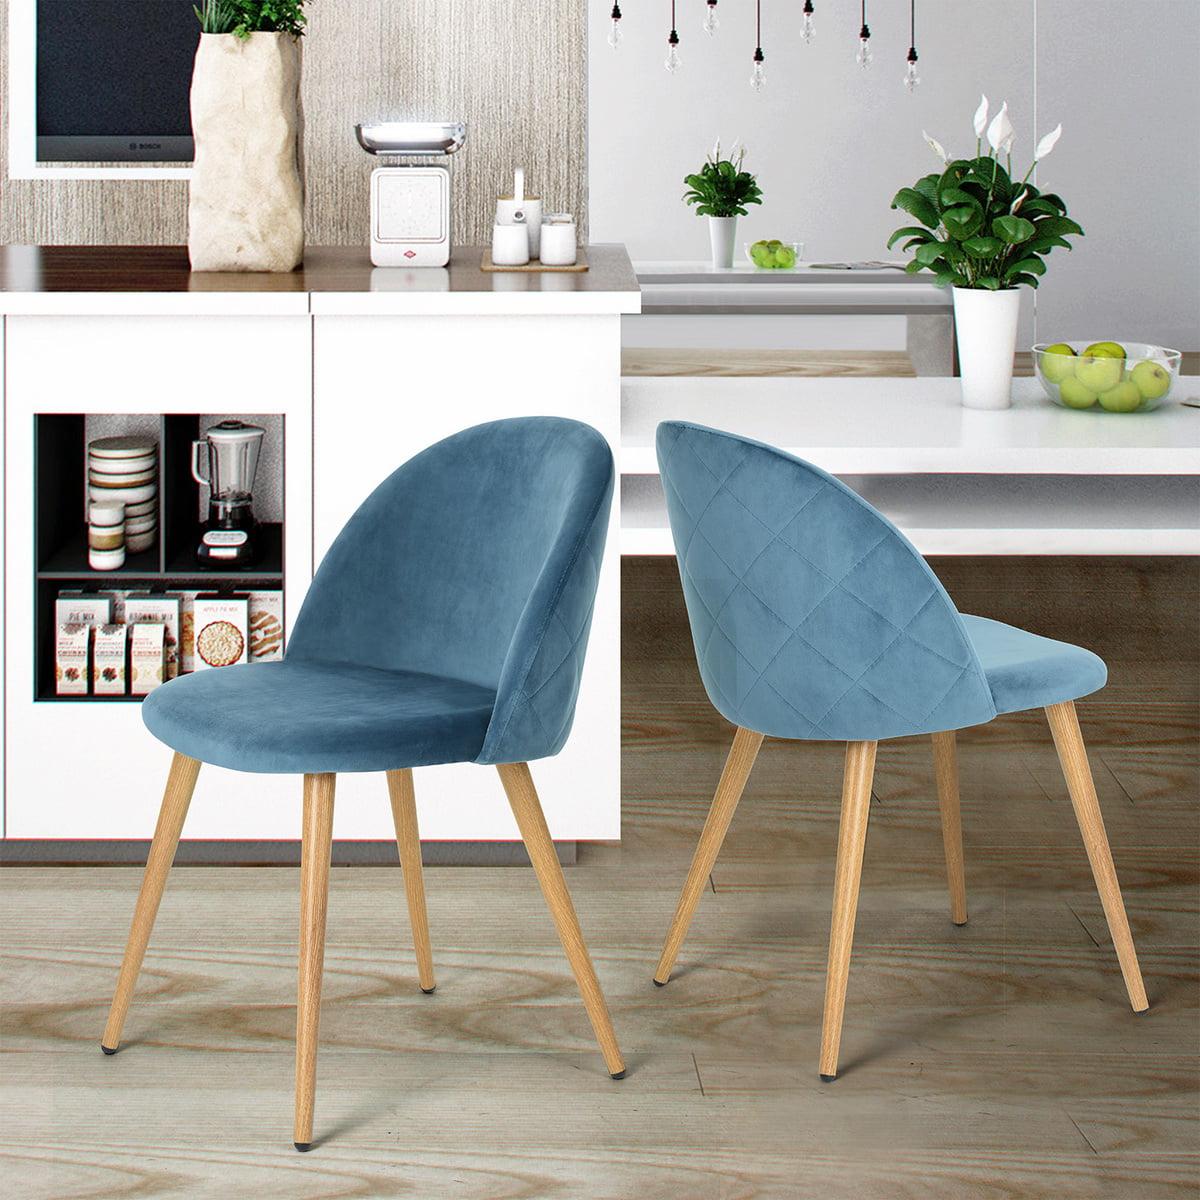 2 Velvet Fabric Accent Chair